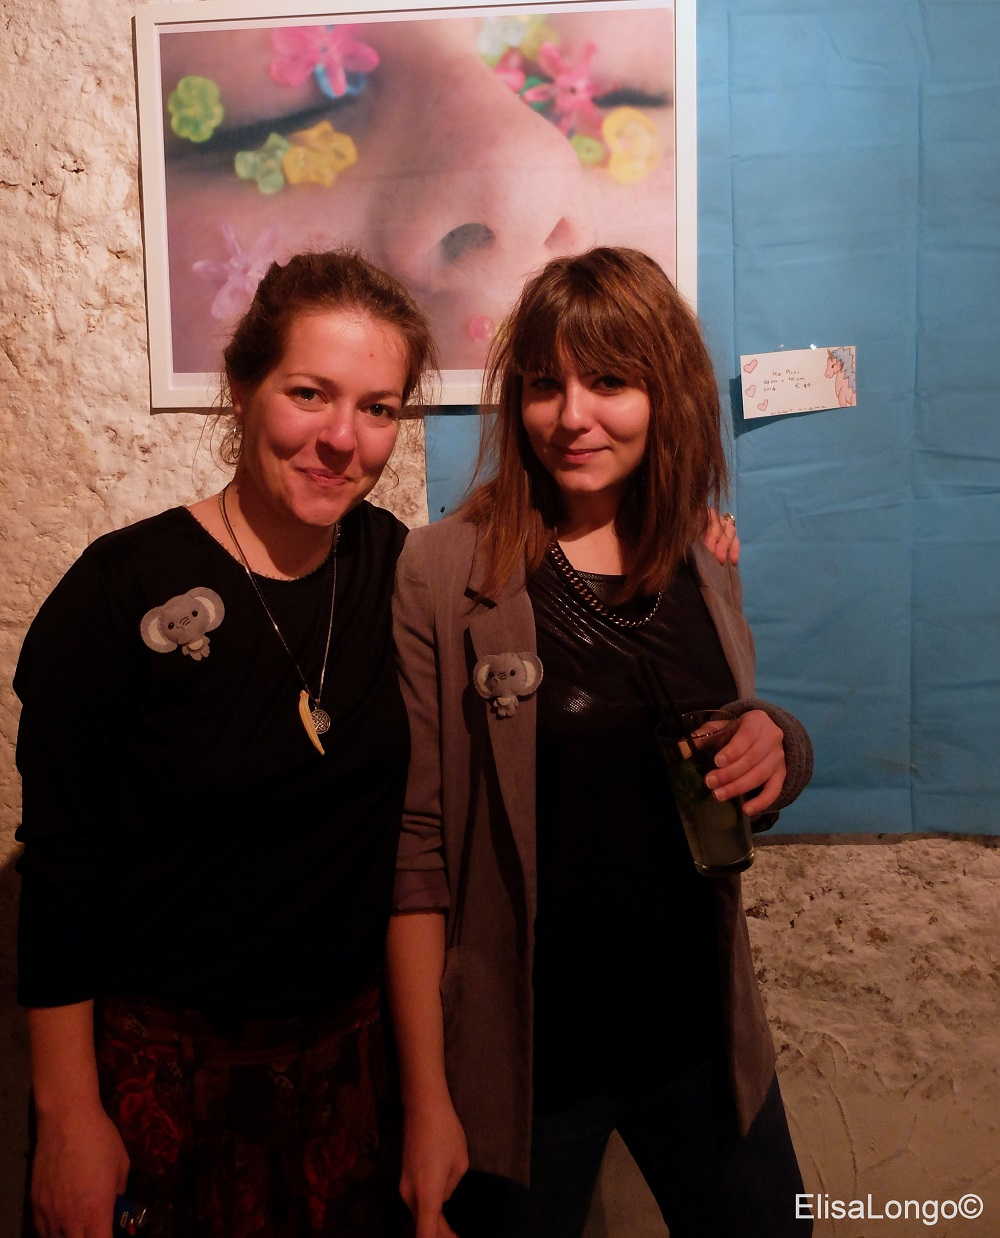 "Intervista di Elisa Longo a Lilly Vigna e Giulia Perreca per la mostra fotografica ""Femminismi di Mare"""